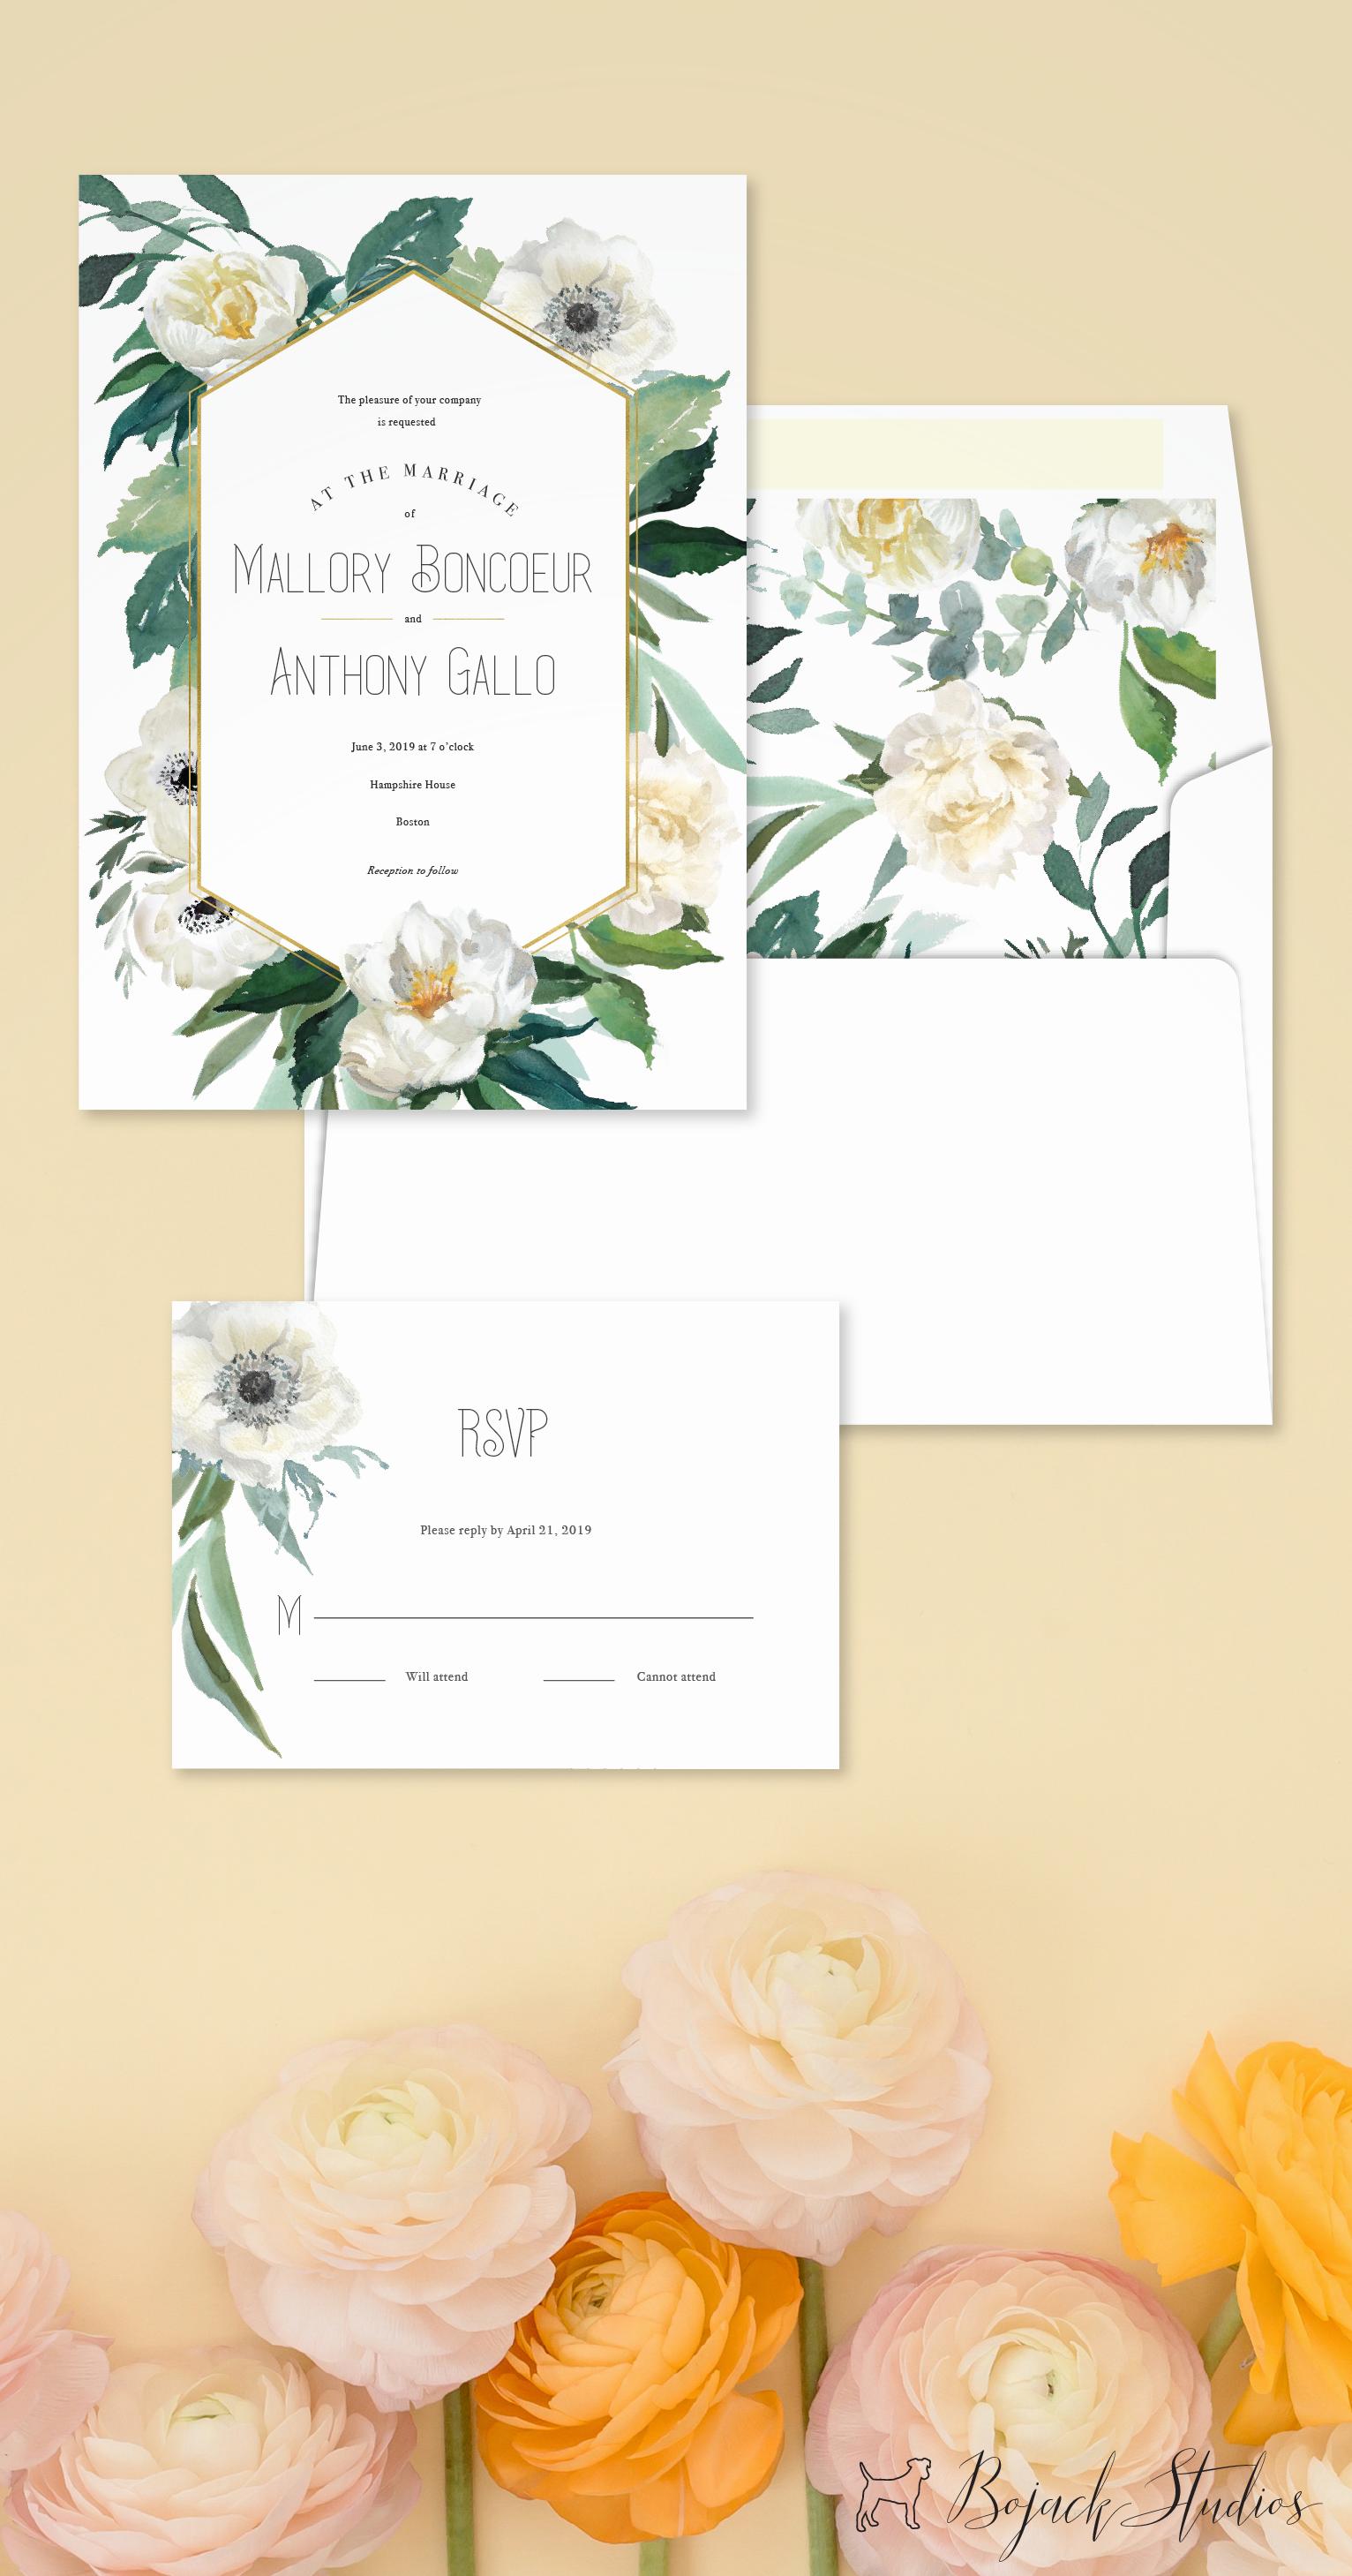 Wedding Decor Stationery Save The Date Invitation Suite Envelope